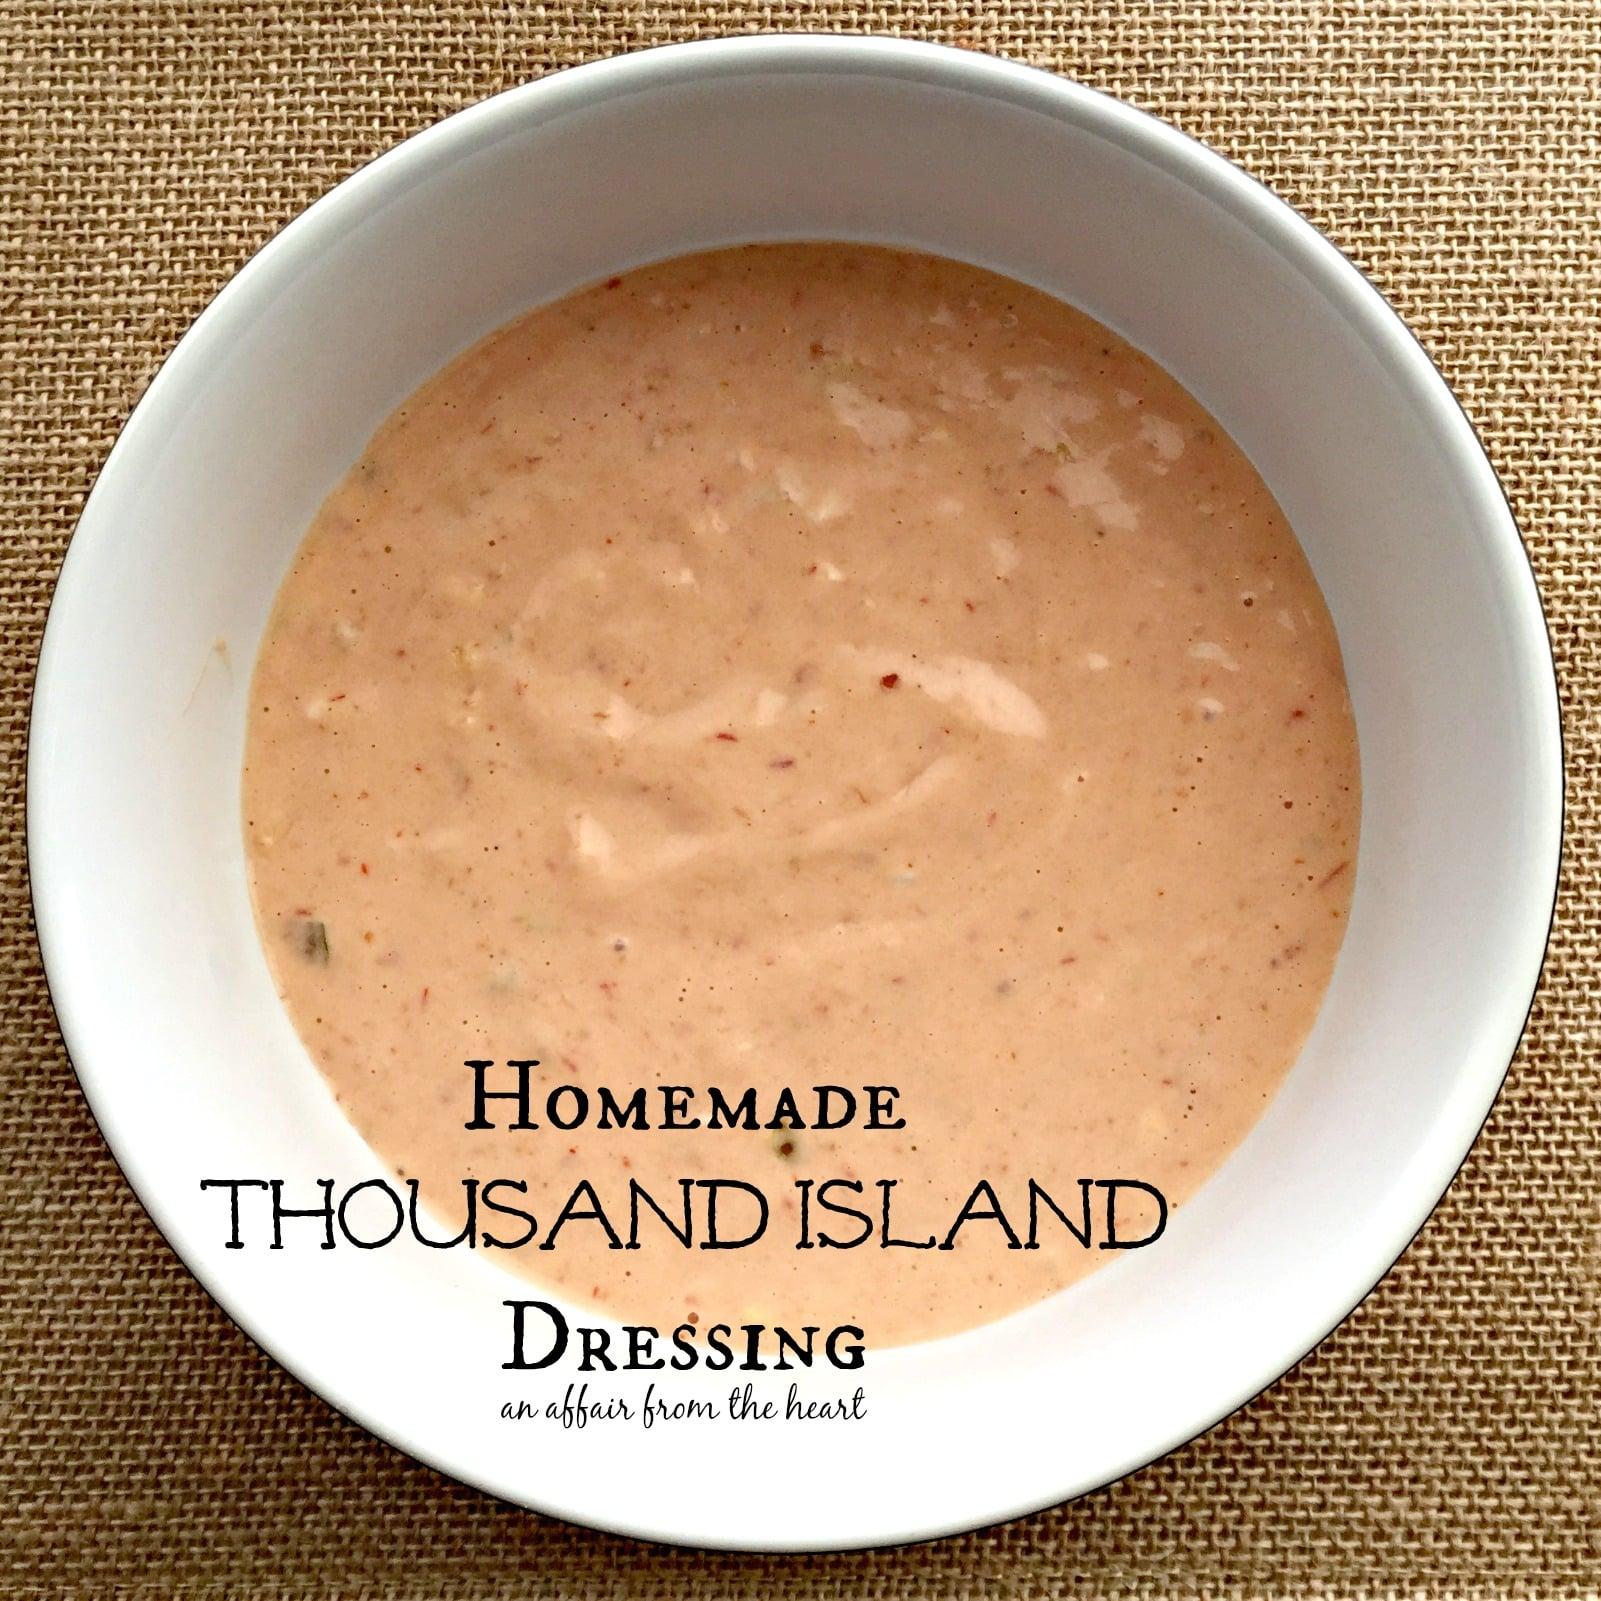 Homemade Thousand Island Dressing